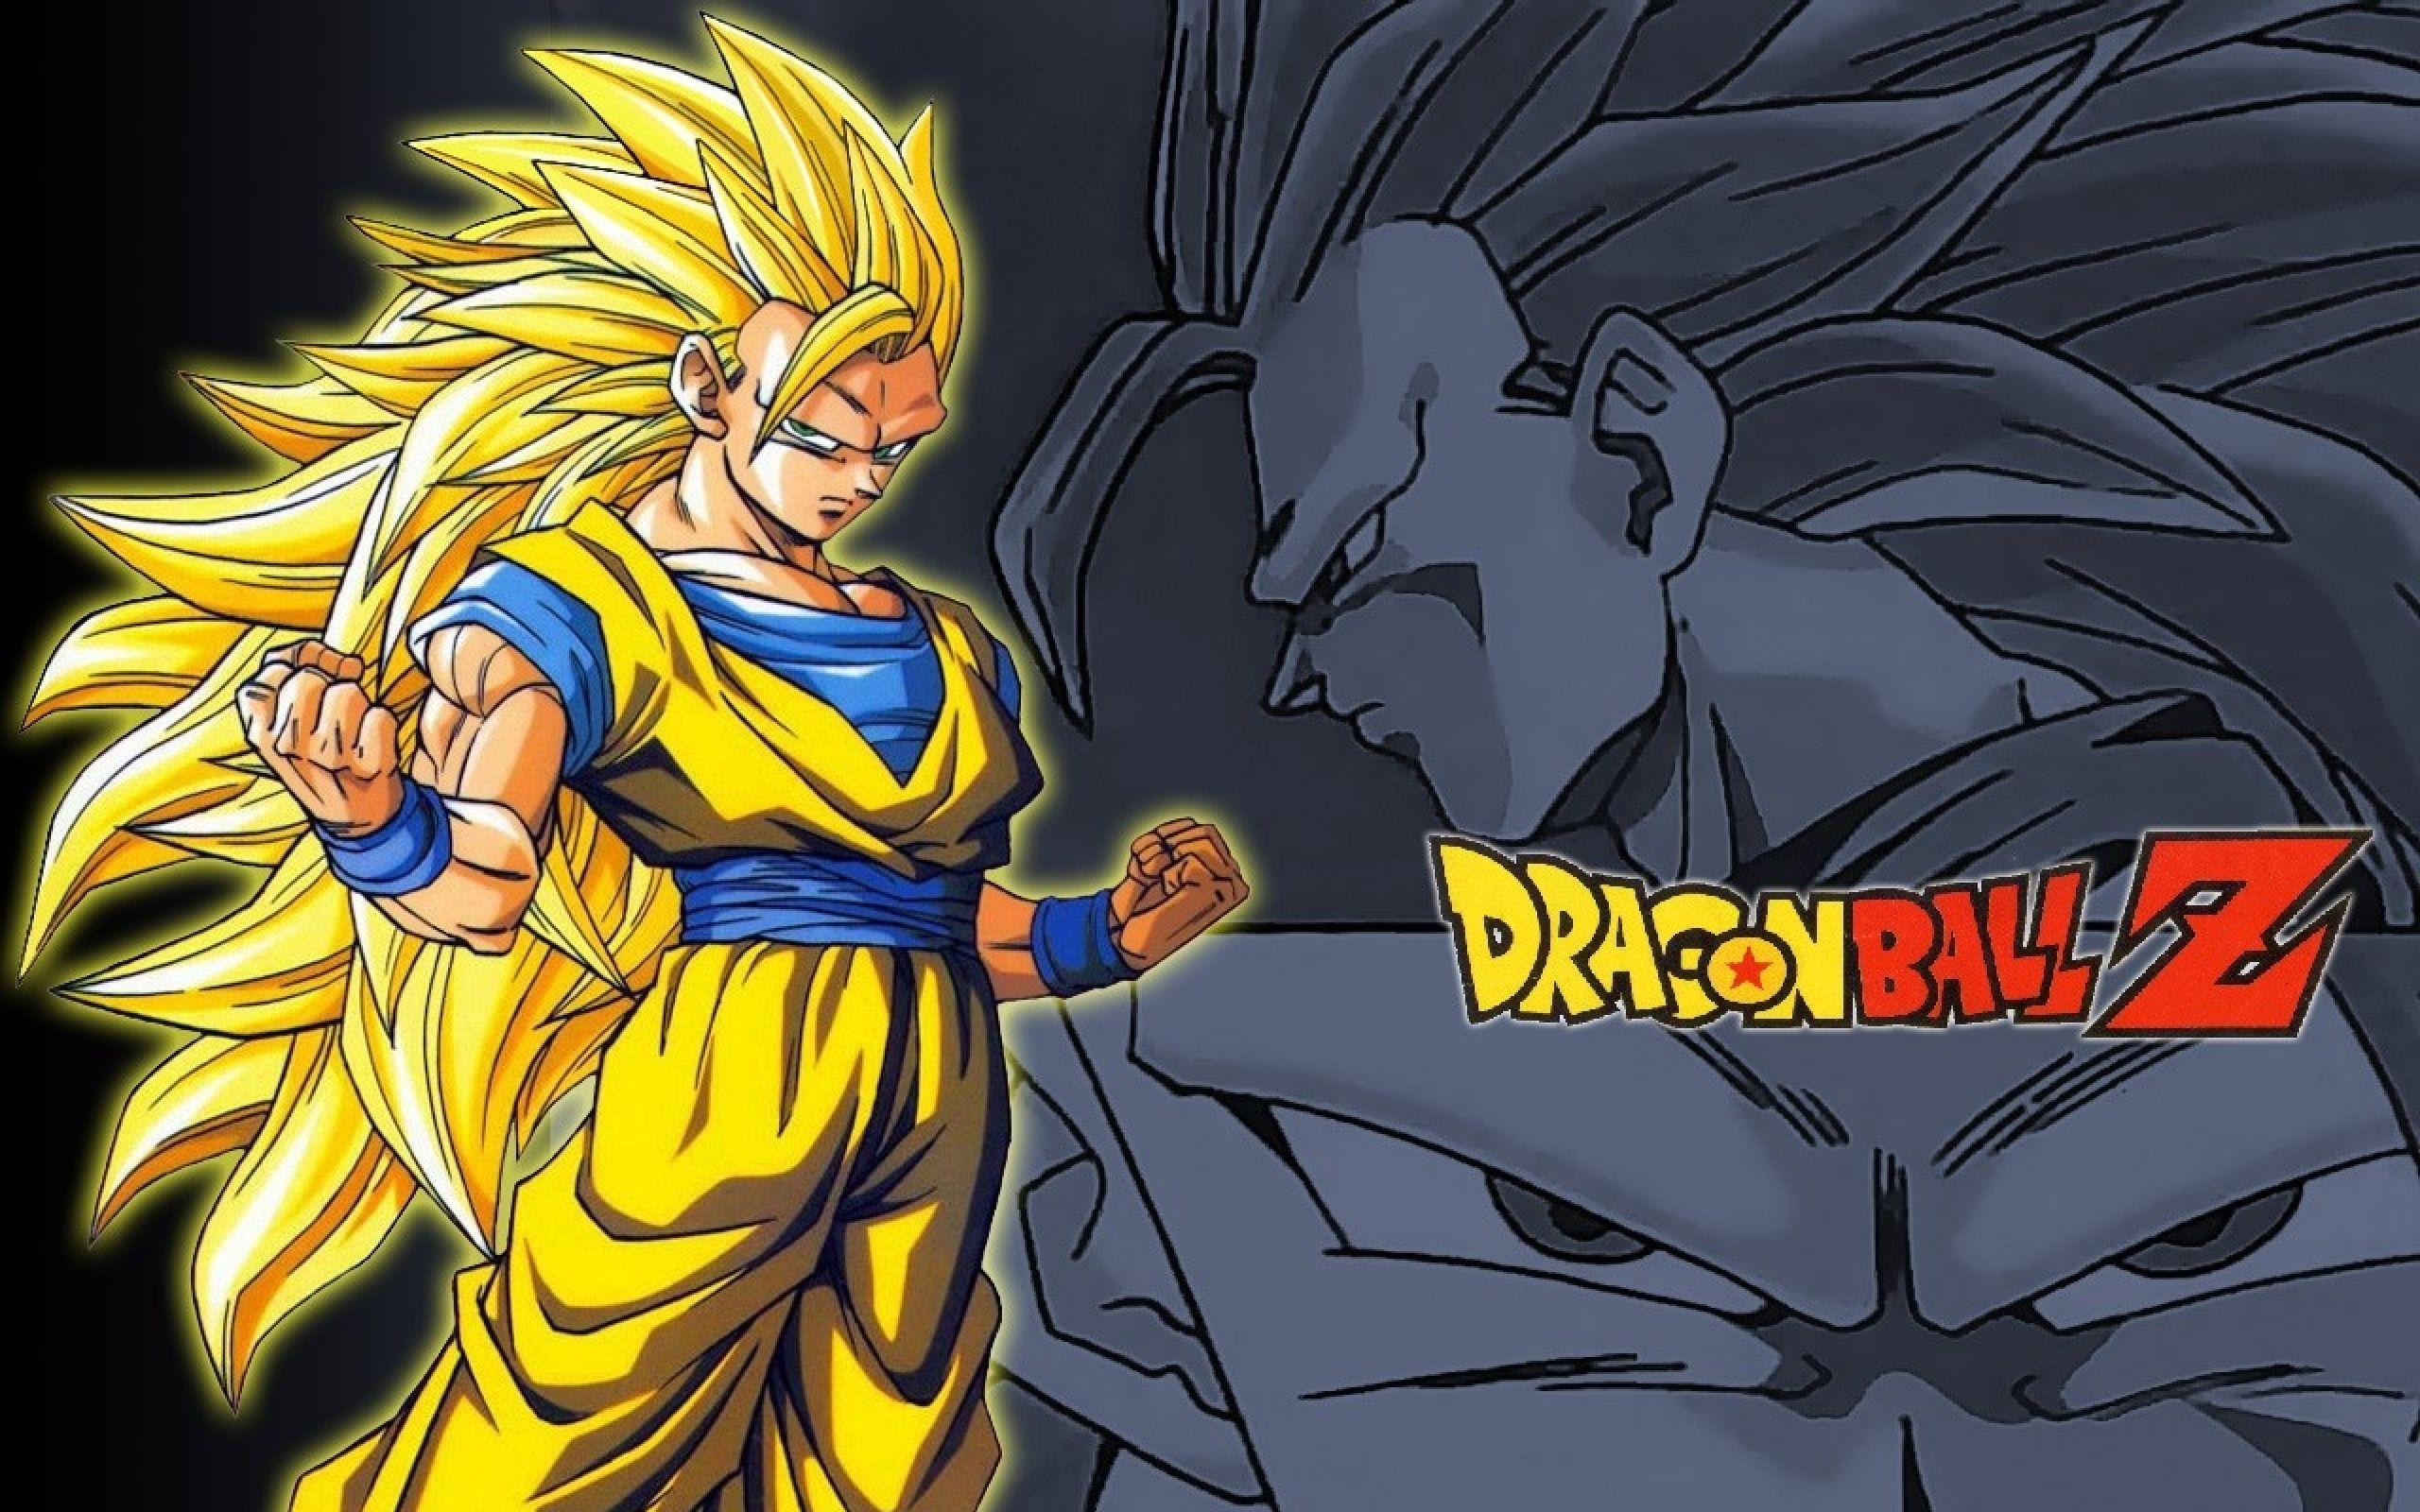 Dragon Ball Z Super Wallpaper Son Goku in Super Saiyan